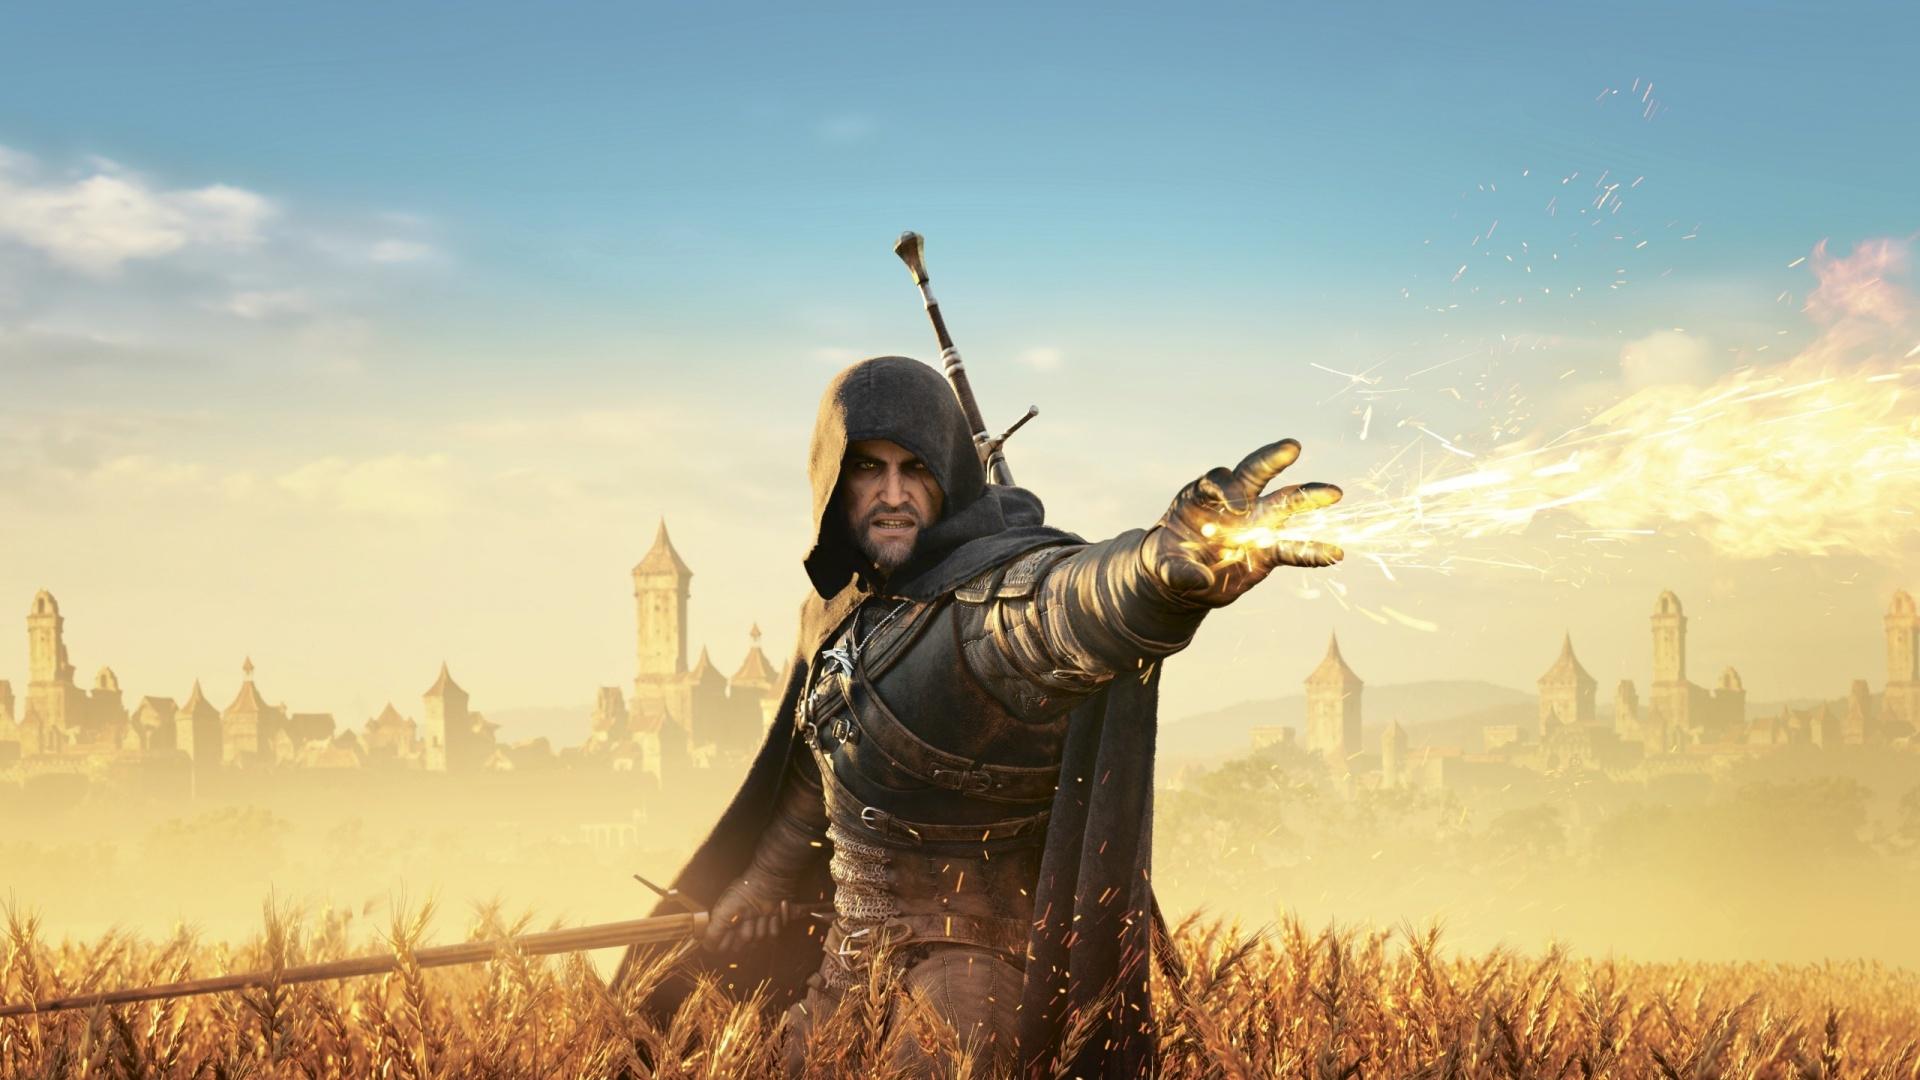 Редактор Eurogamer намекнул на скорый анонс третьего «Ведьмака» для Nintendo Switch